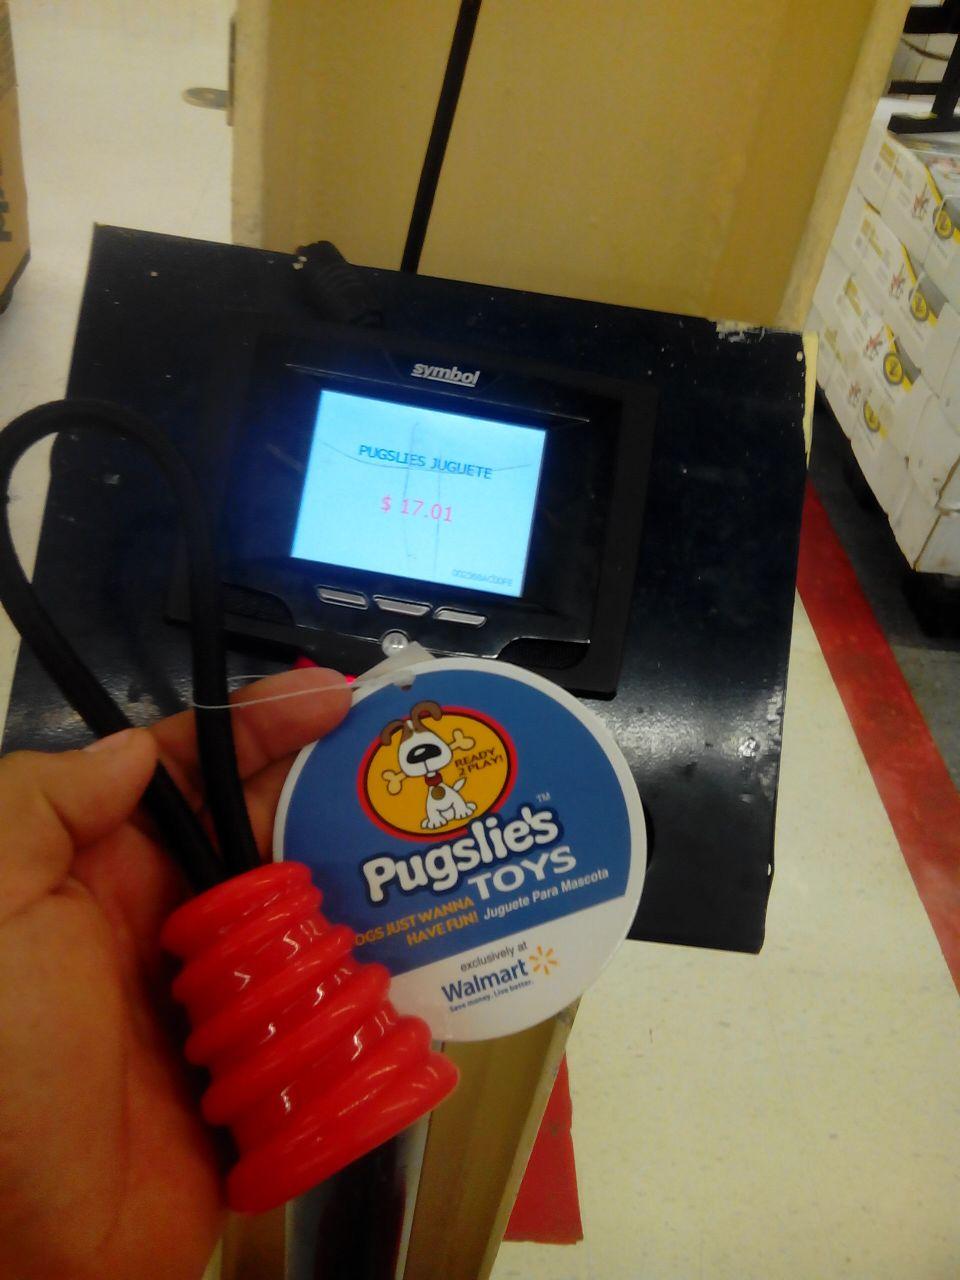 Walmart Tampico Av. Hidalgo: juguete para perro Pugslies a $17.01